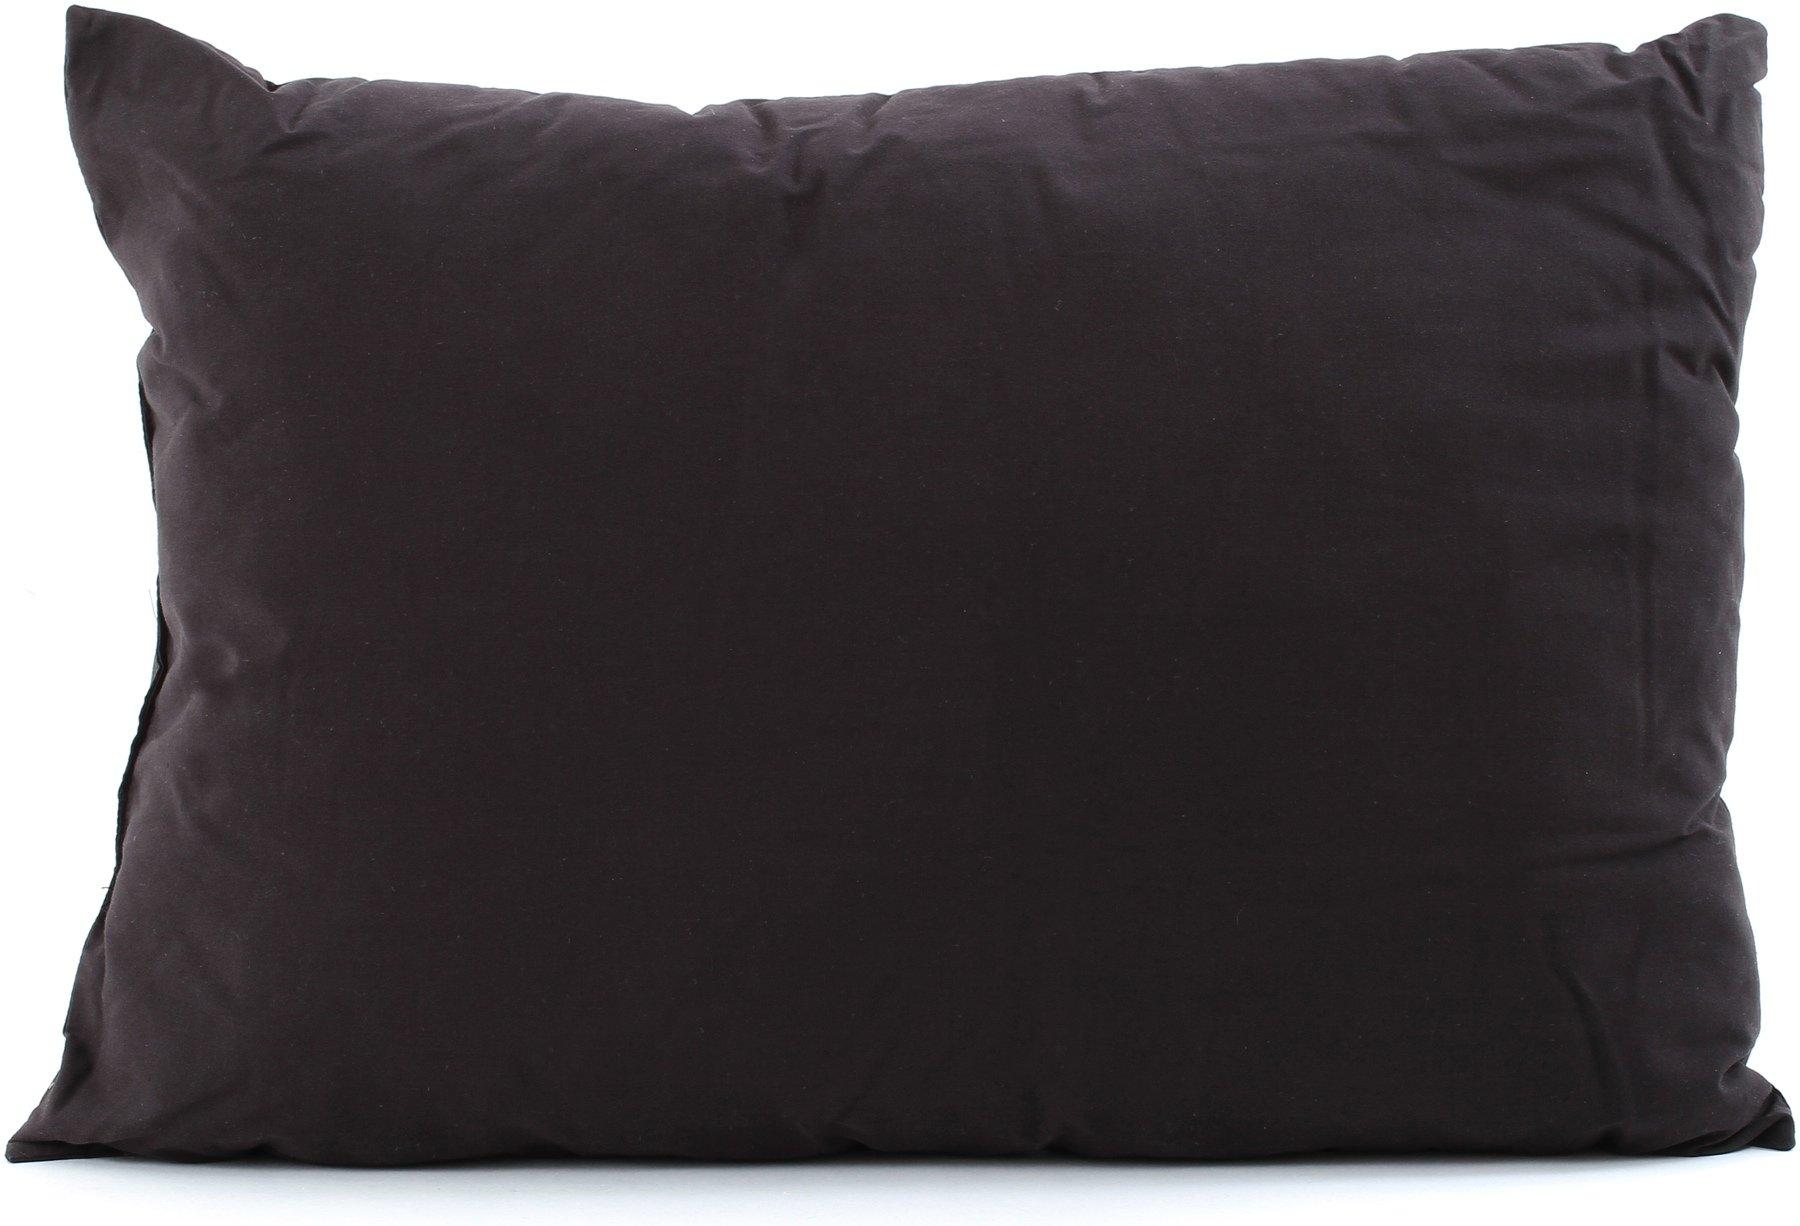 PDP Bass Drum Pillow image 1